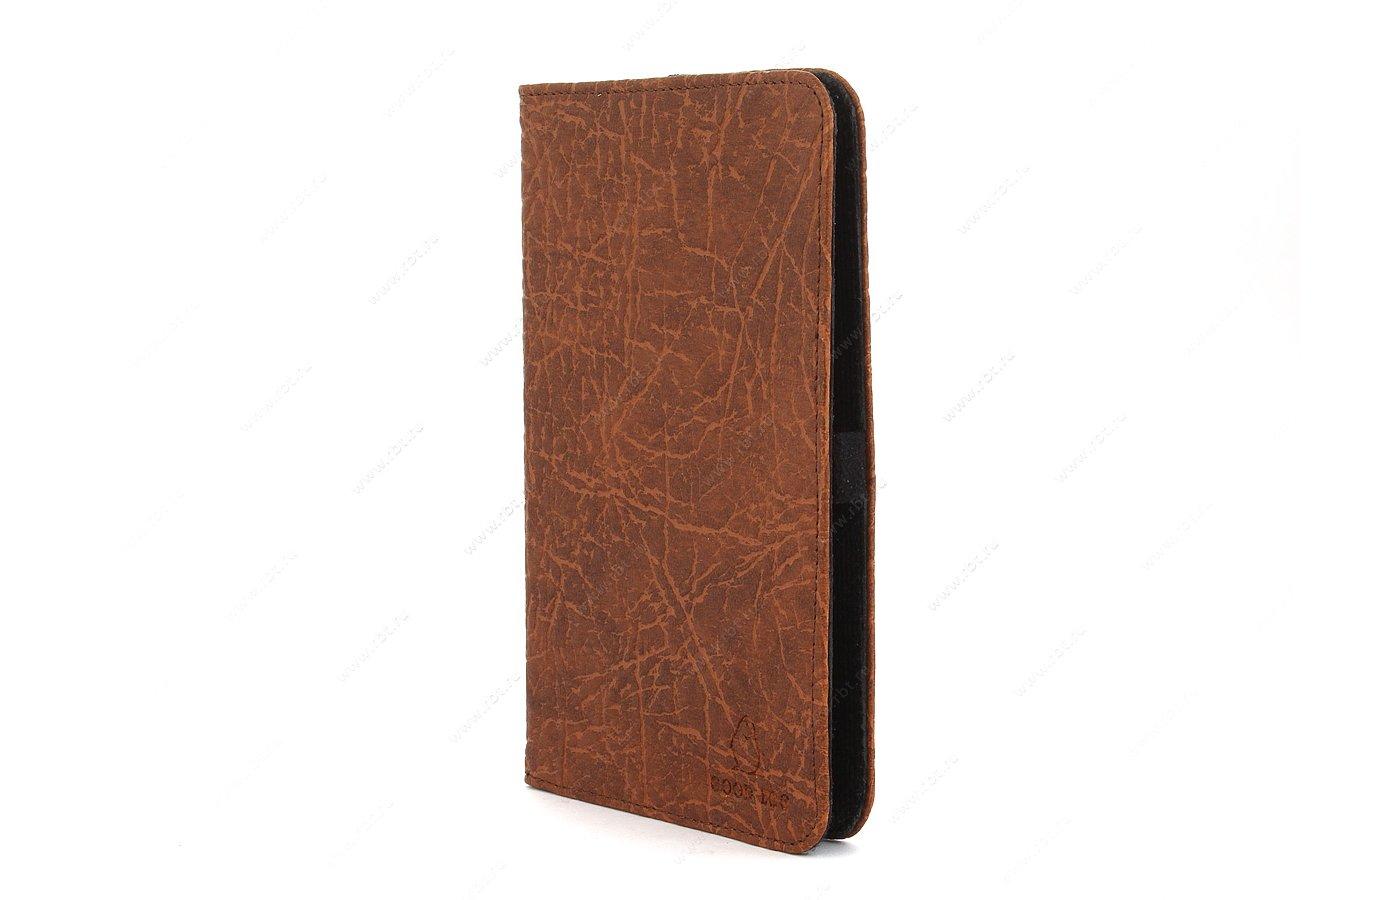 Чехол GoodEgg для PocketBook 614/624/626/640 кожа коричневый (GE-PB624LIR2213)